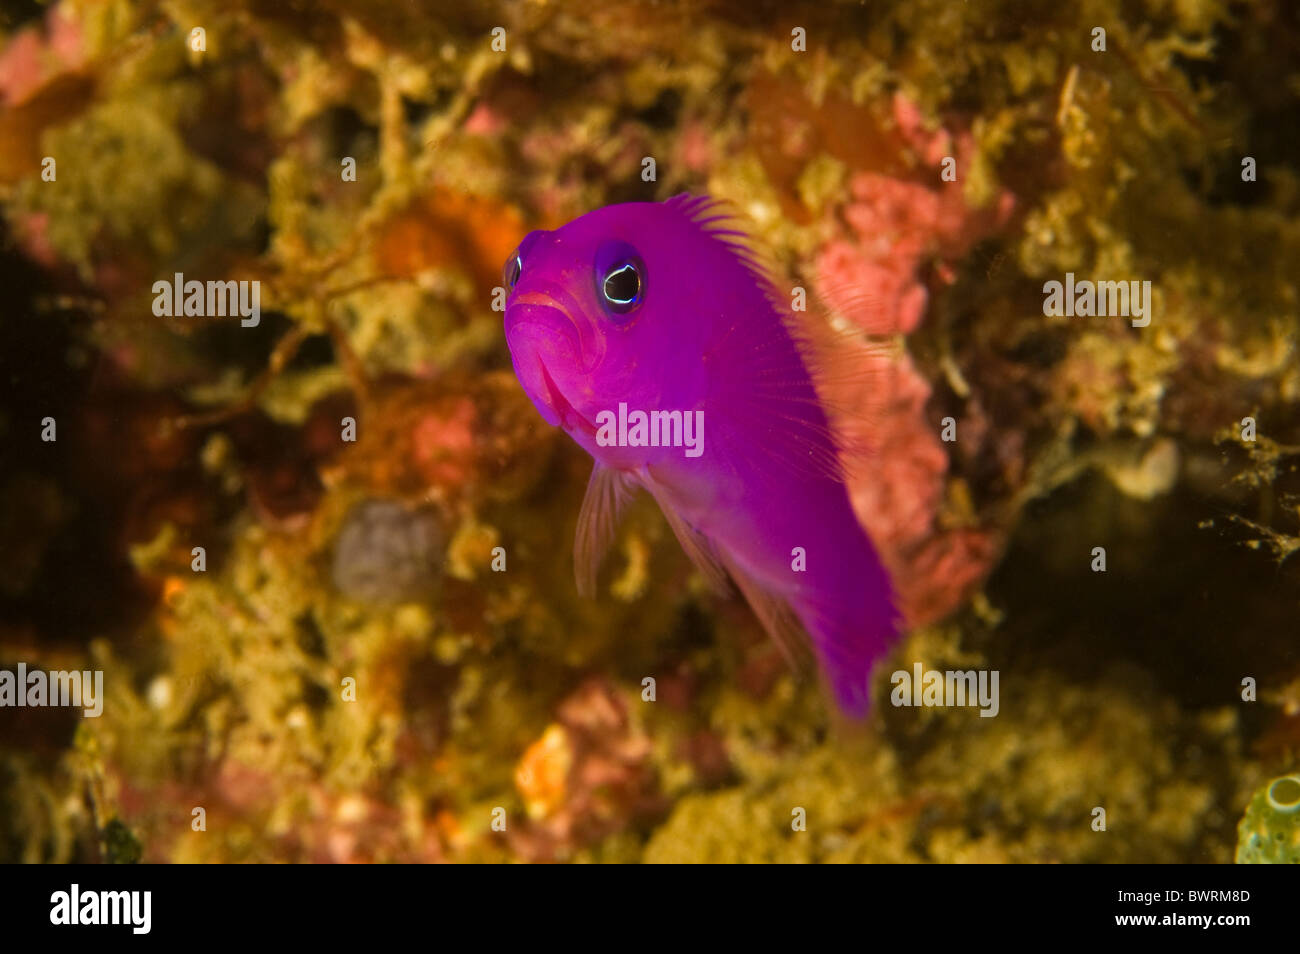 Magenta dotyback, Pseudochromis porphyreus, Raja Ampat Indonesia - Stock Image